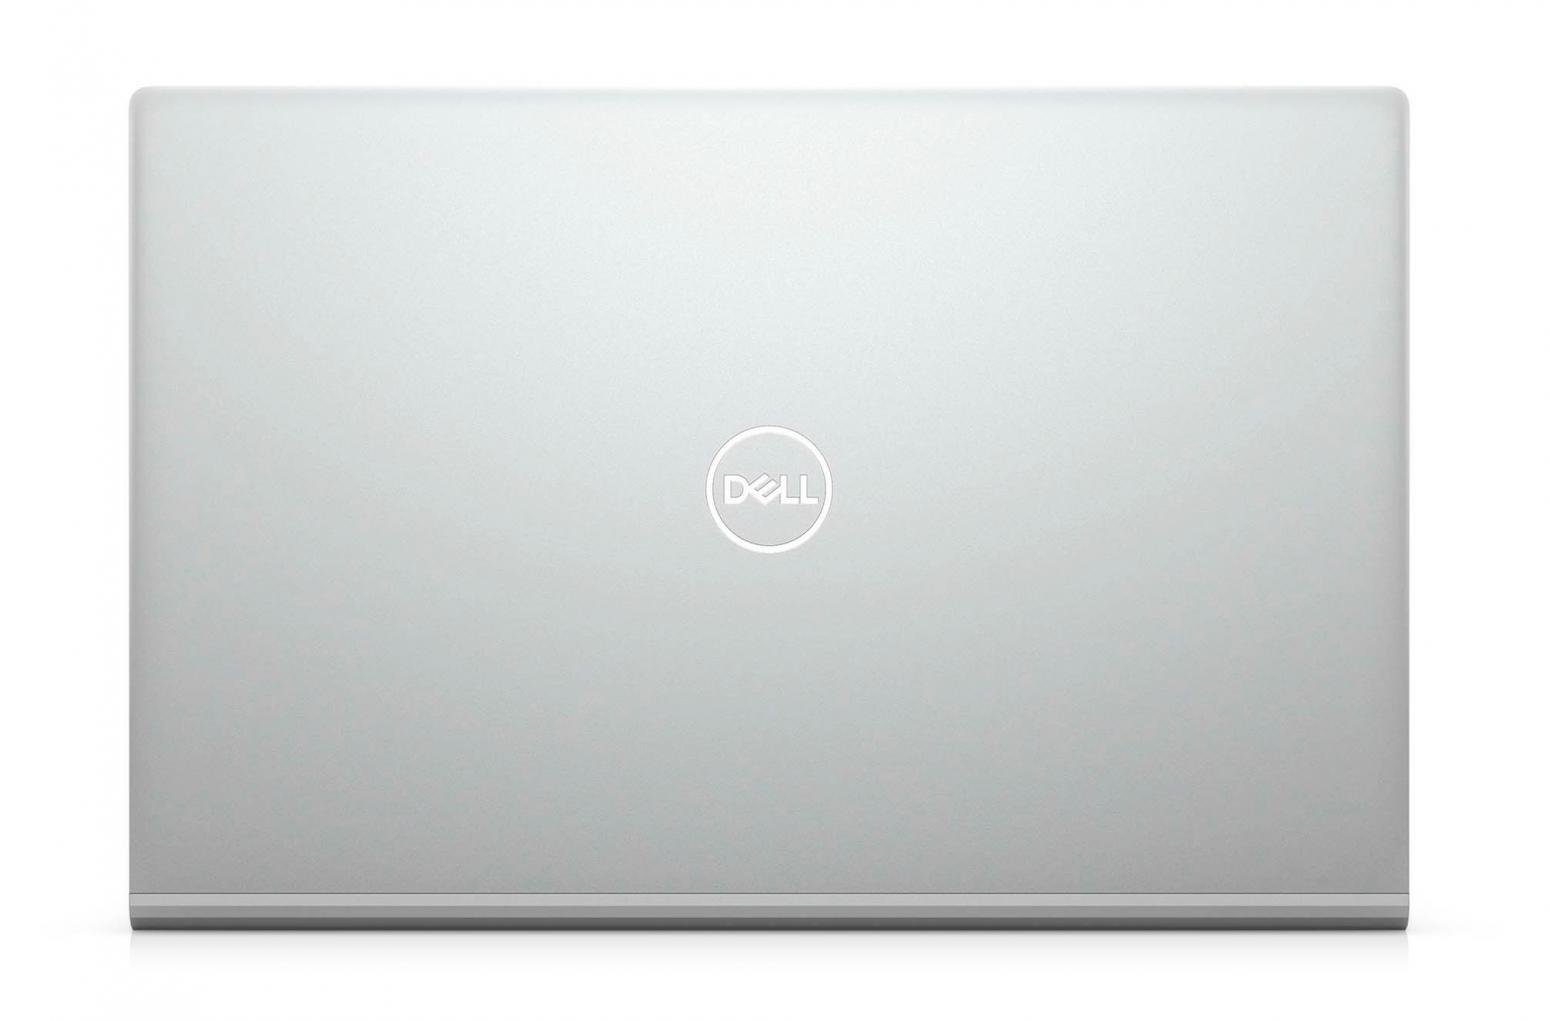 Ordinateur portable Dell Inspiron 15 5502 Argent - Core i5, SSD 256 Go - photo 7